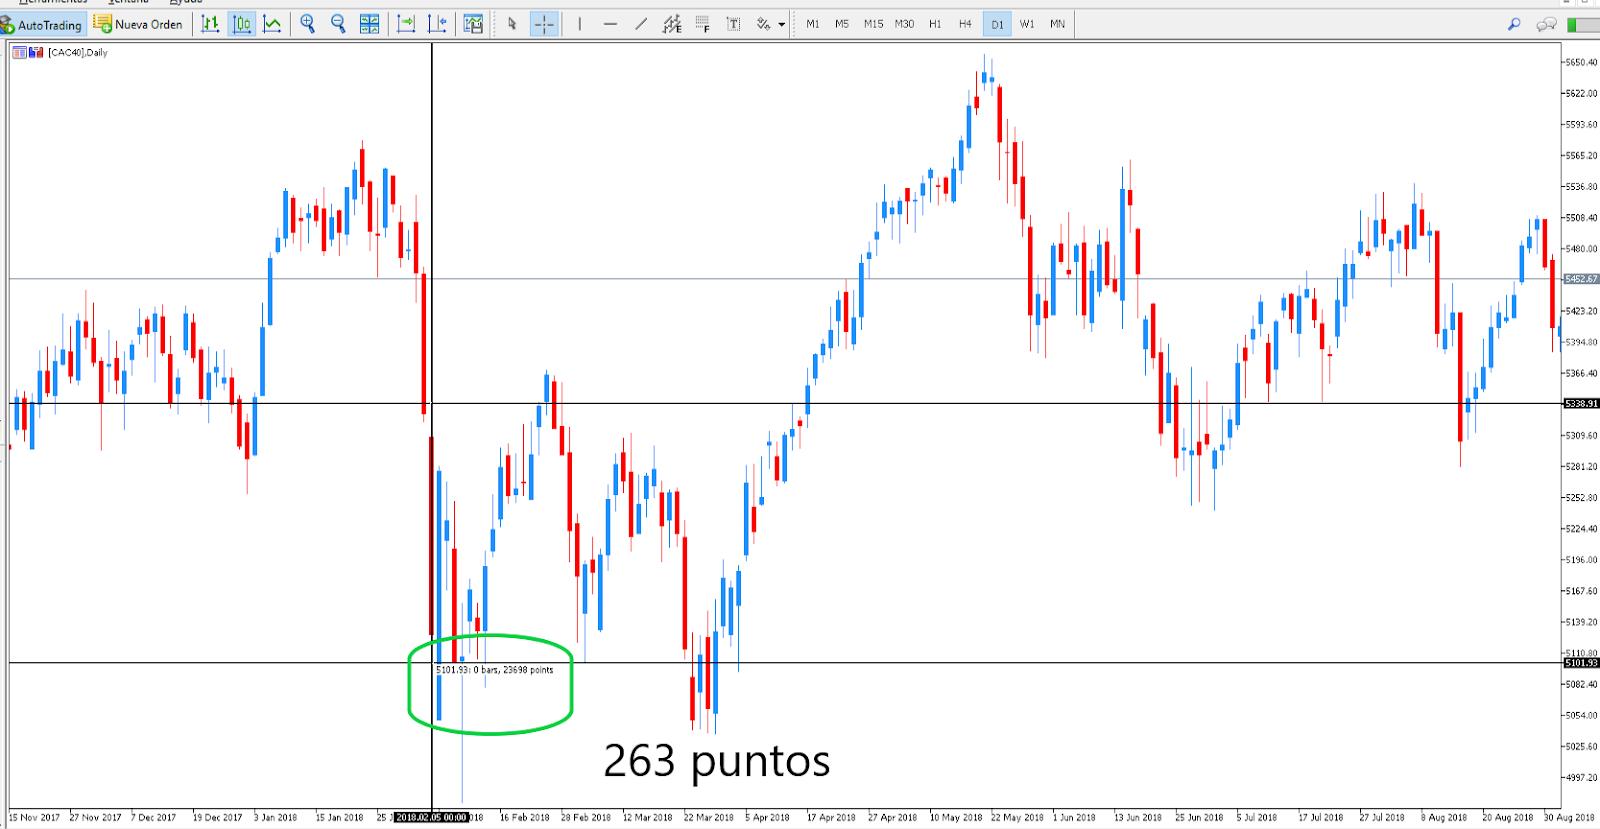 indice bursátil CAC40